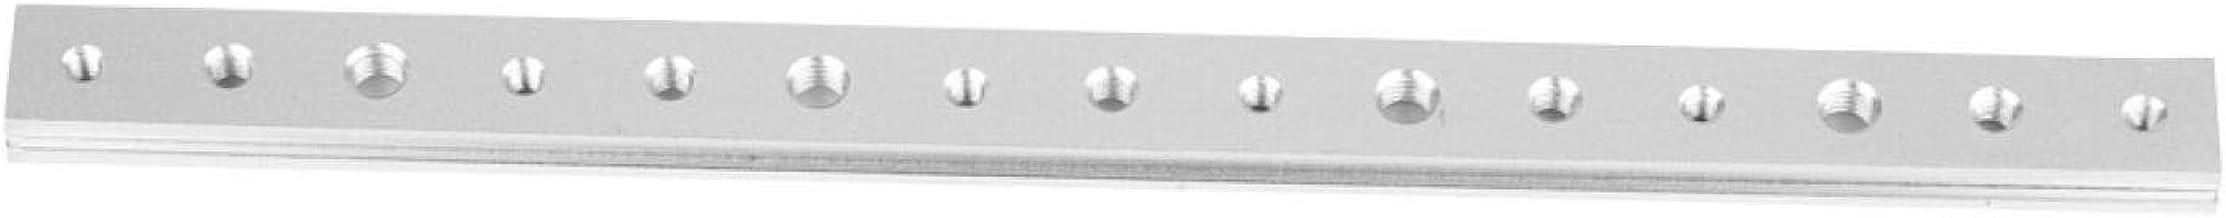 Amusingtao Sierra de mesa de calibre para ingletes